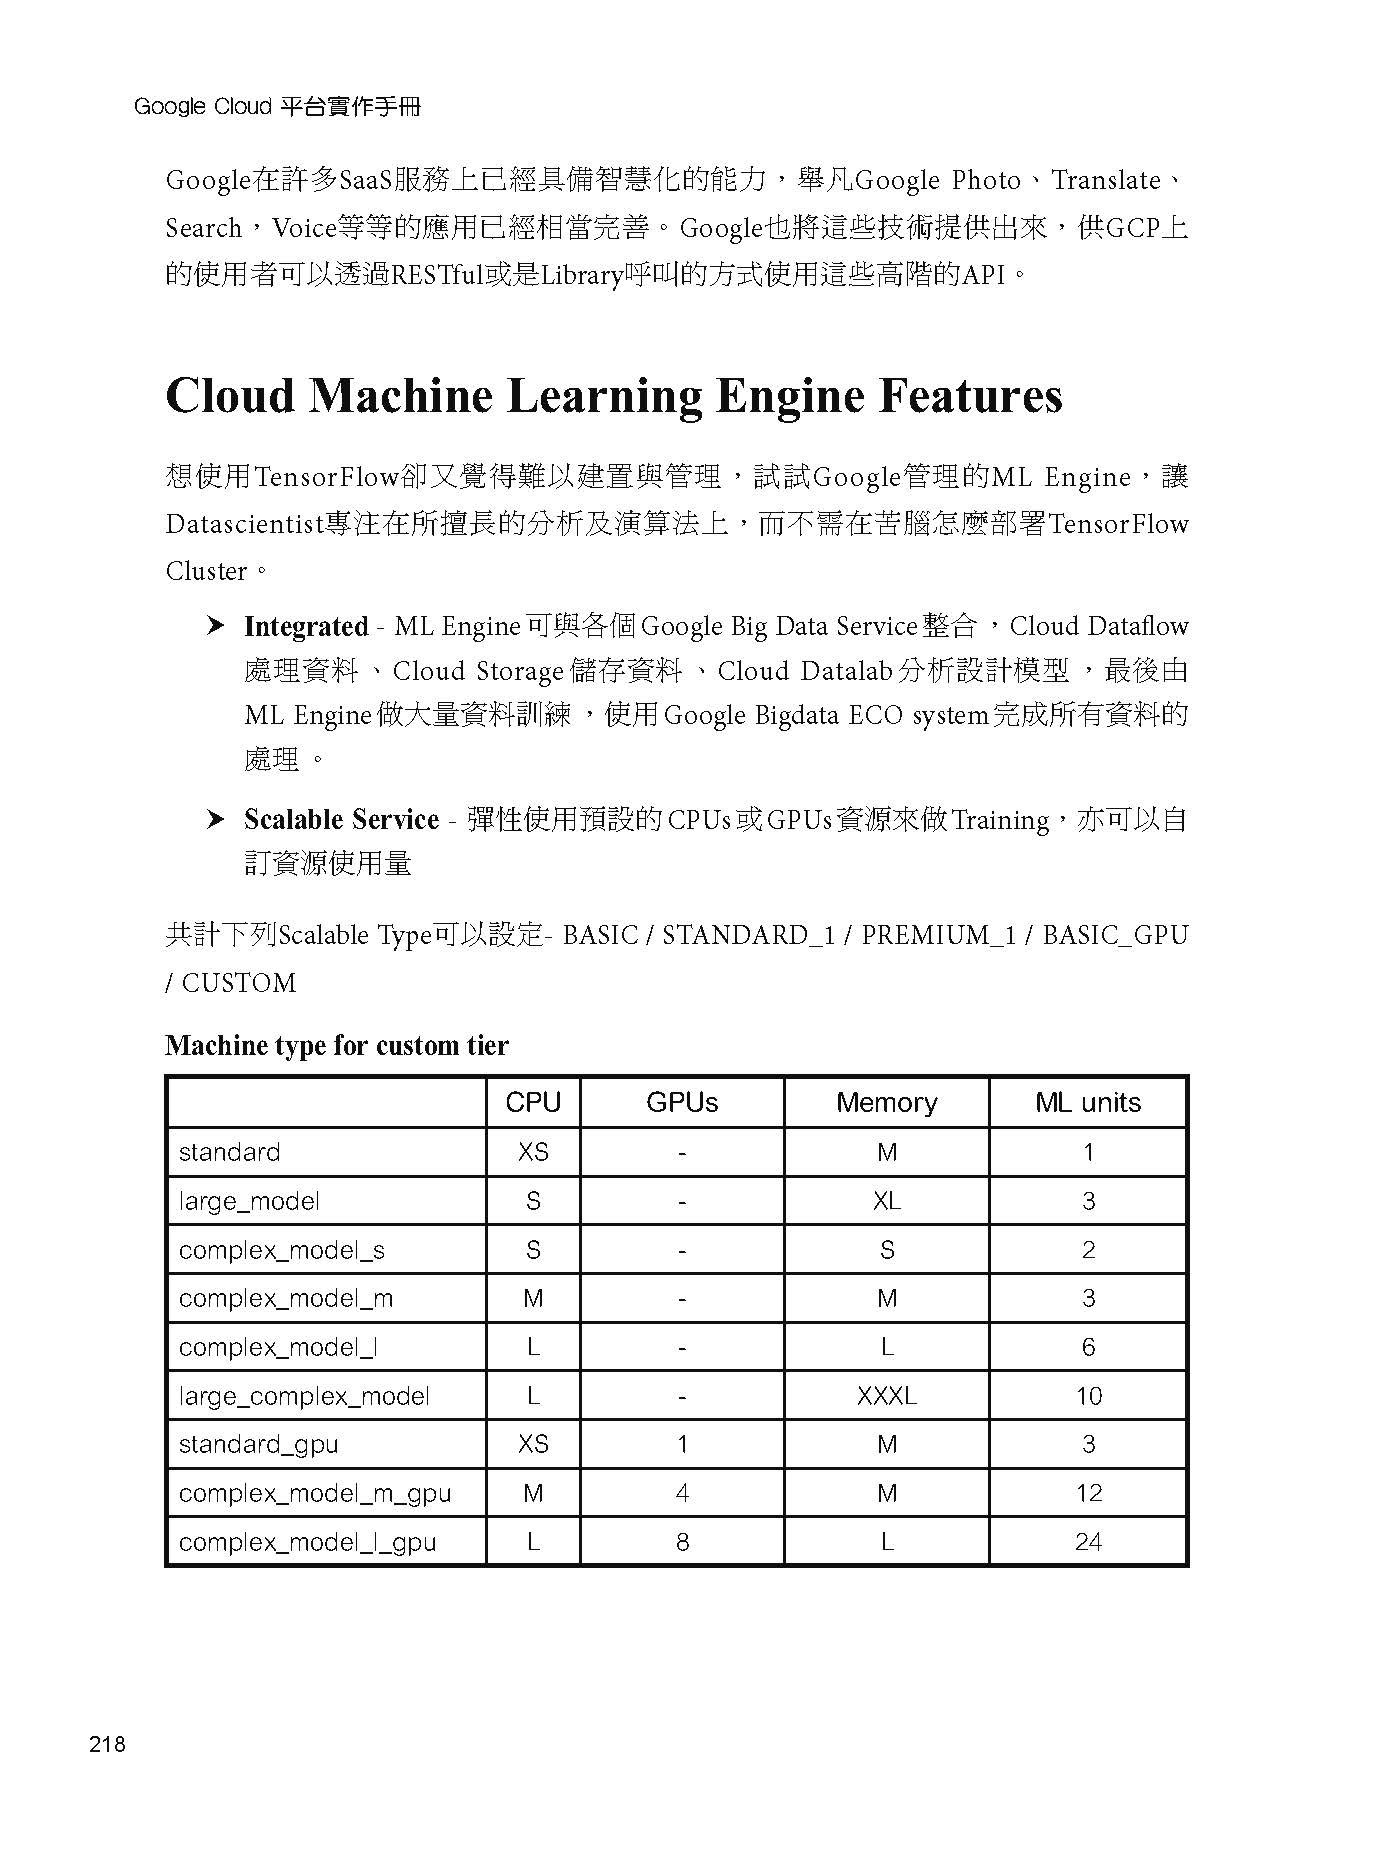 Google Cloud 雲端平台實作手冊 ─ Google雲端功能一點就通-preview-8